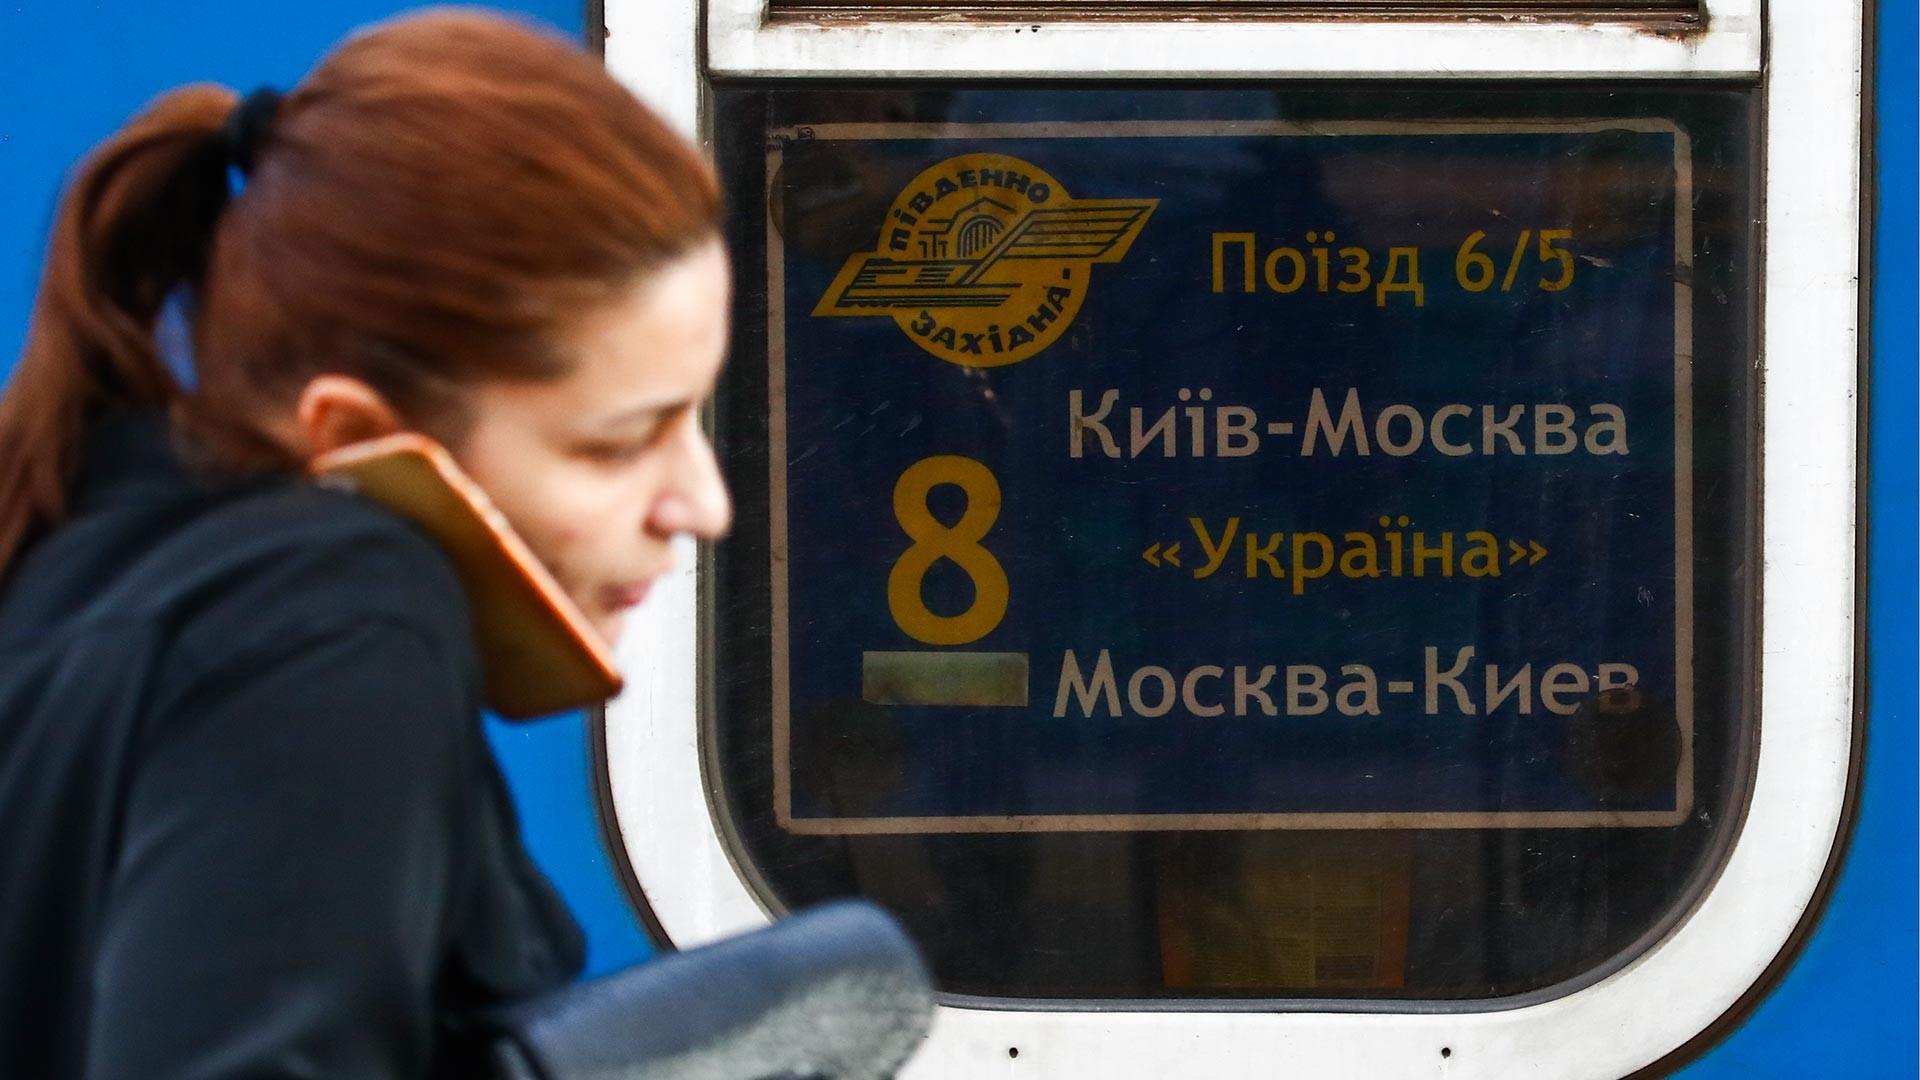 The Kiev-Moscow train at the Kievsky railway station, Moscow.